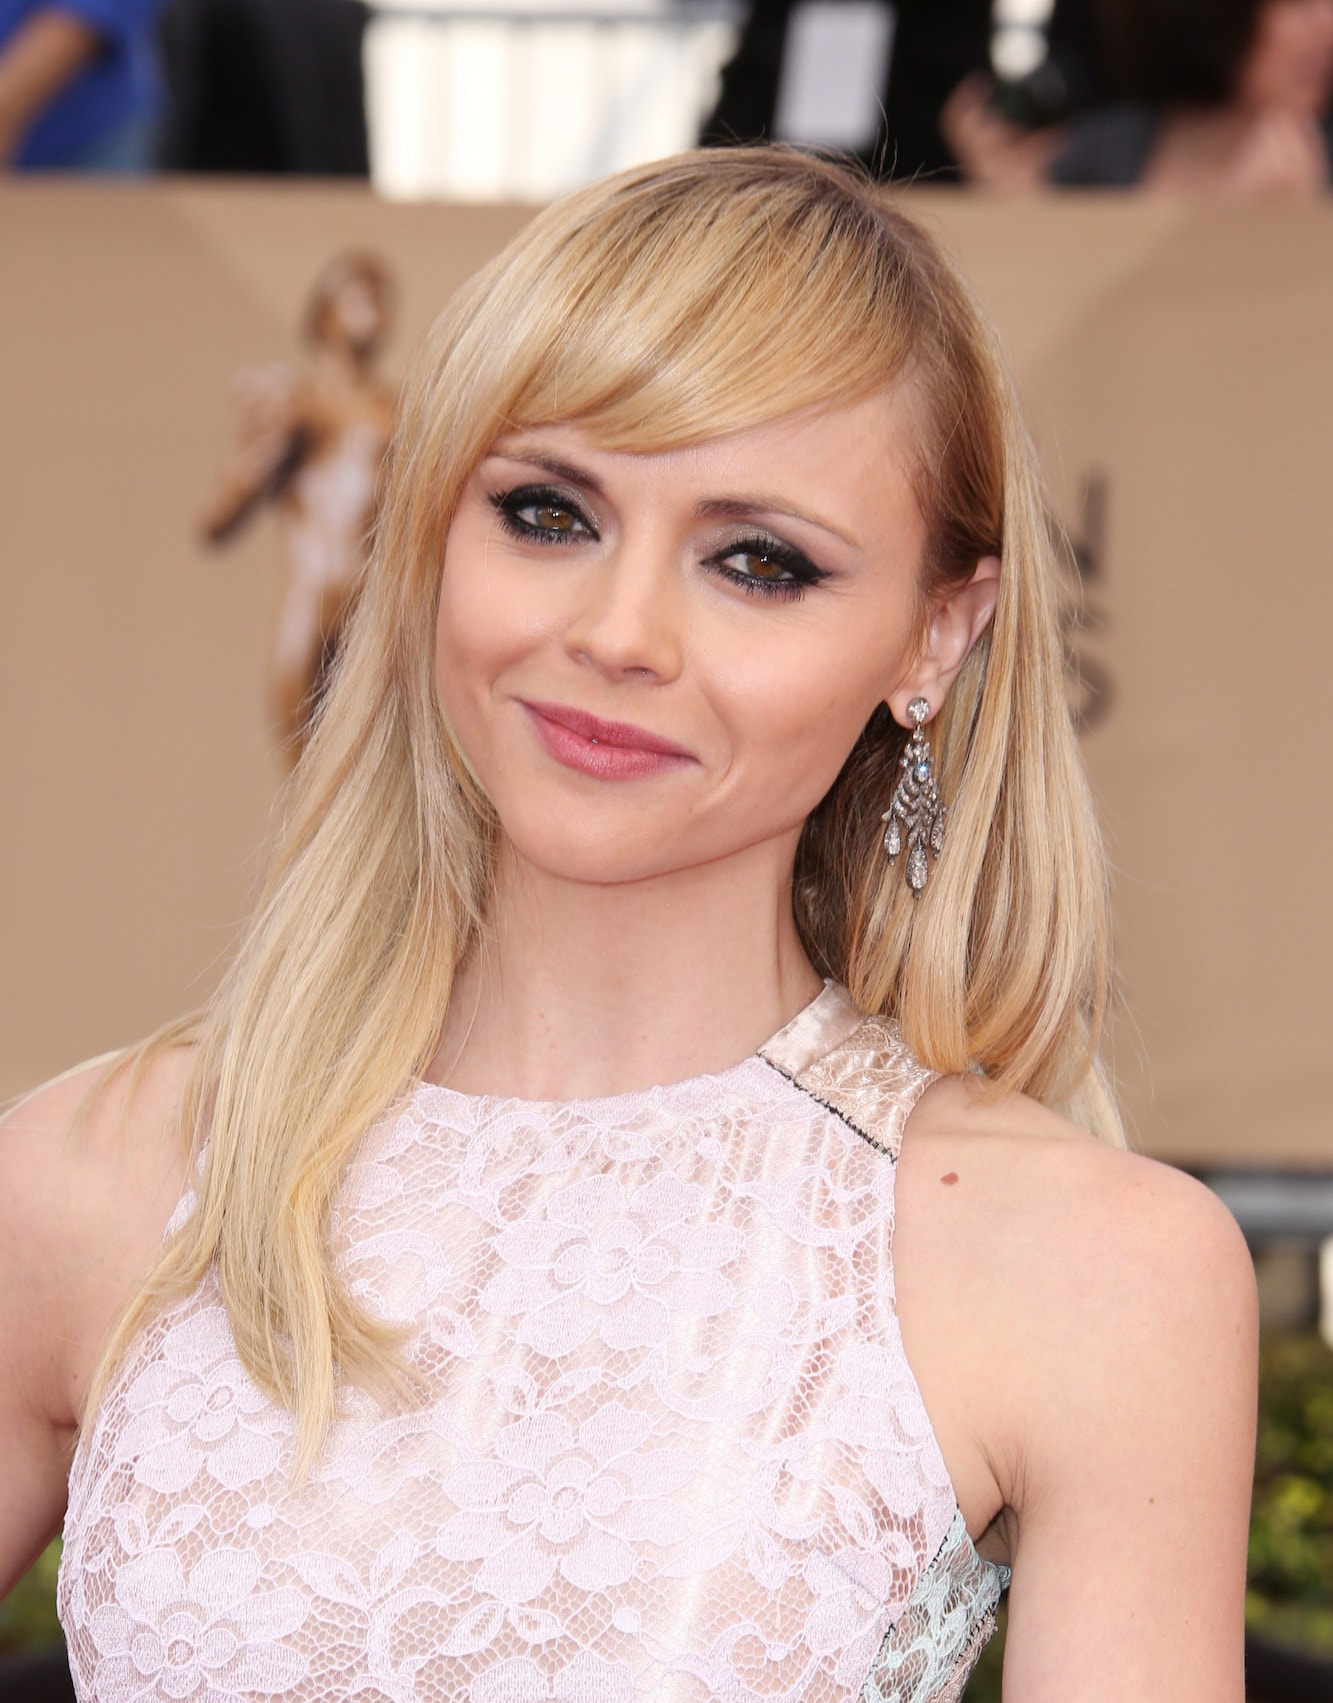 2 christina ricci dengan model rambut lurus dan poni samping